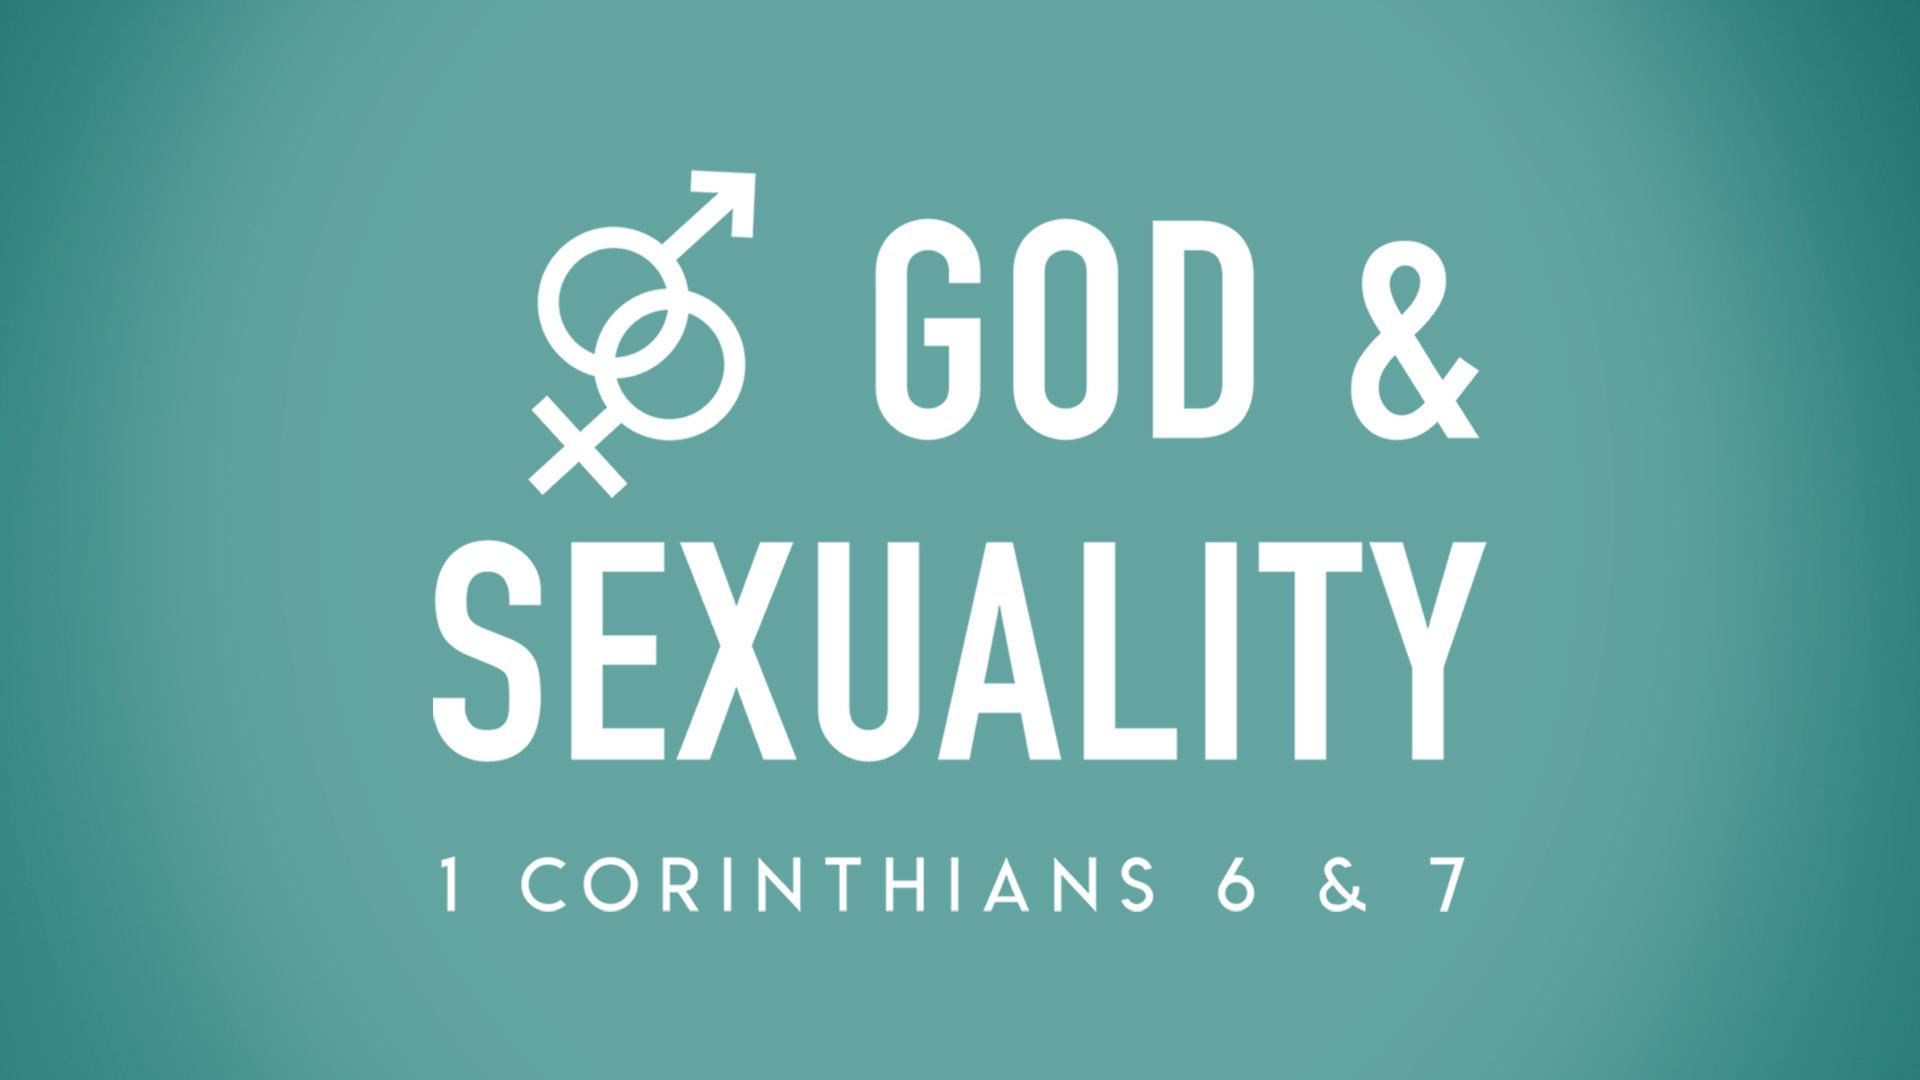 God_Sexuality-9_16.jpg